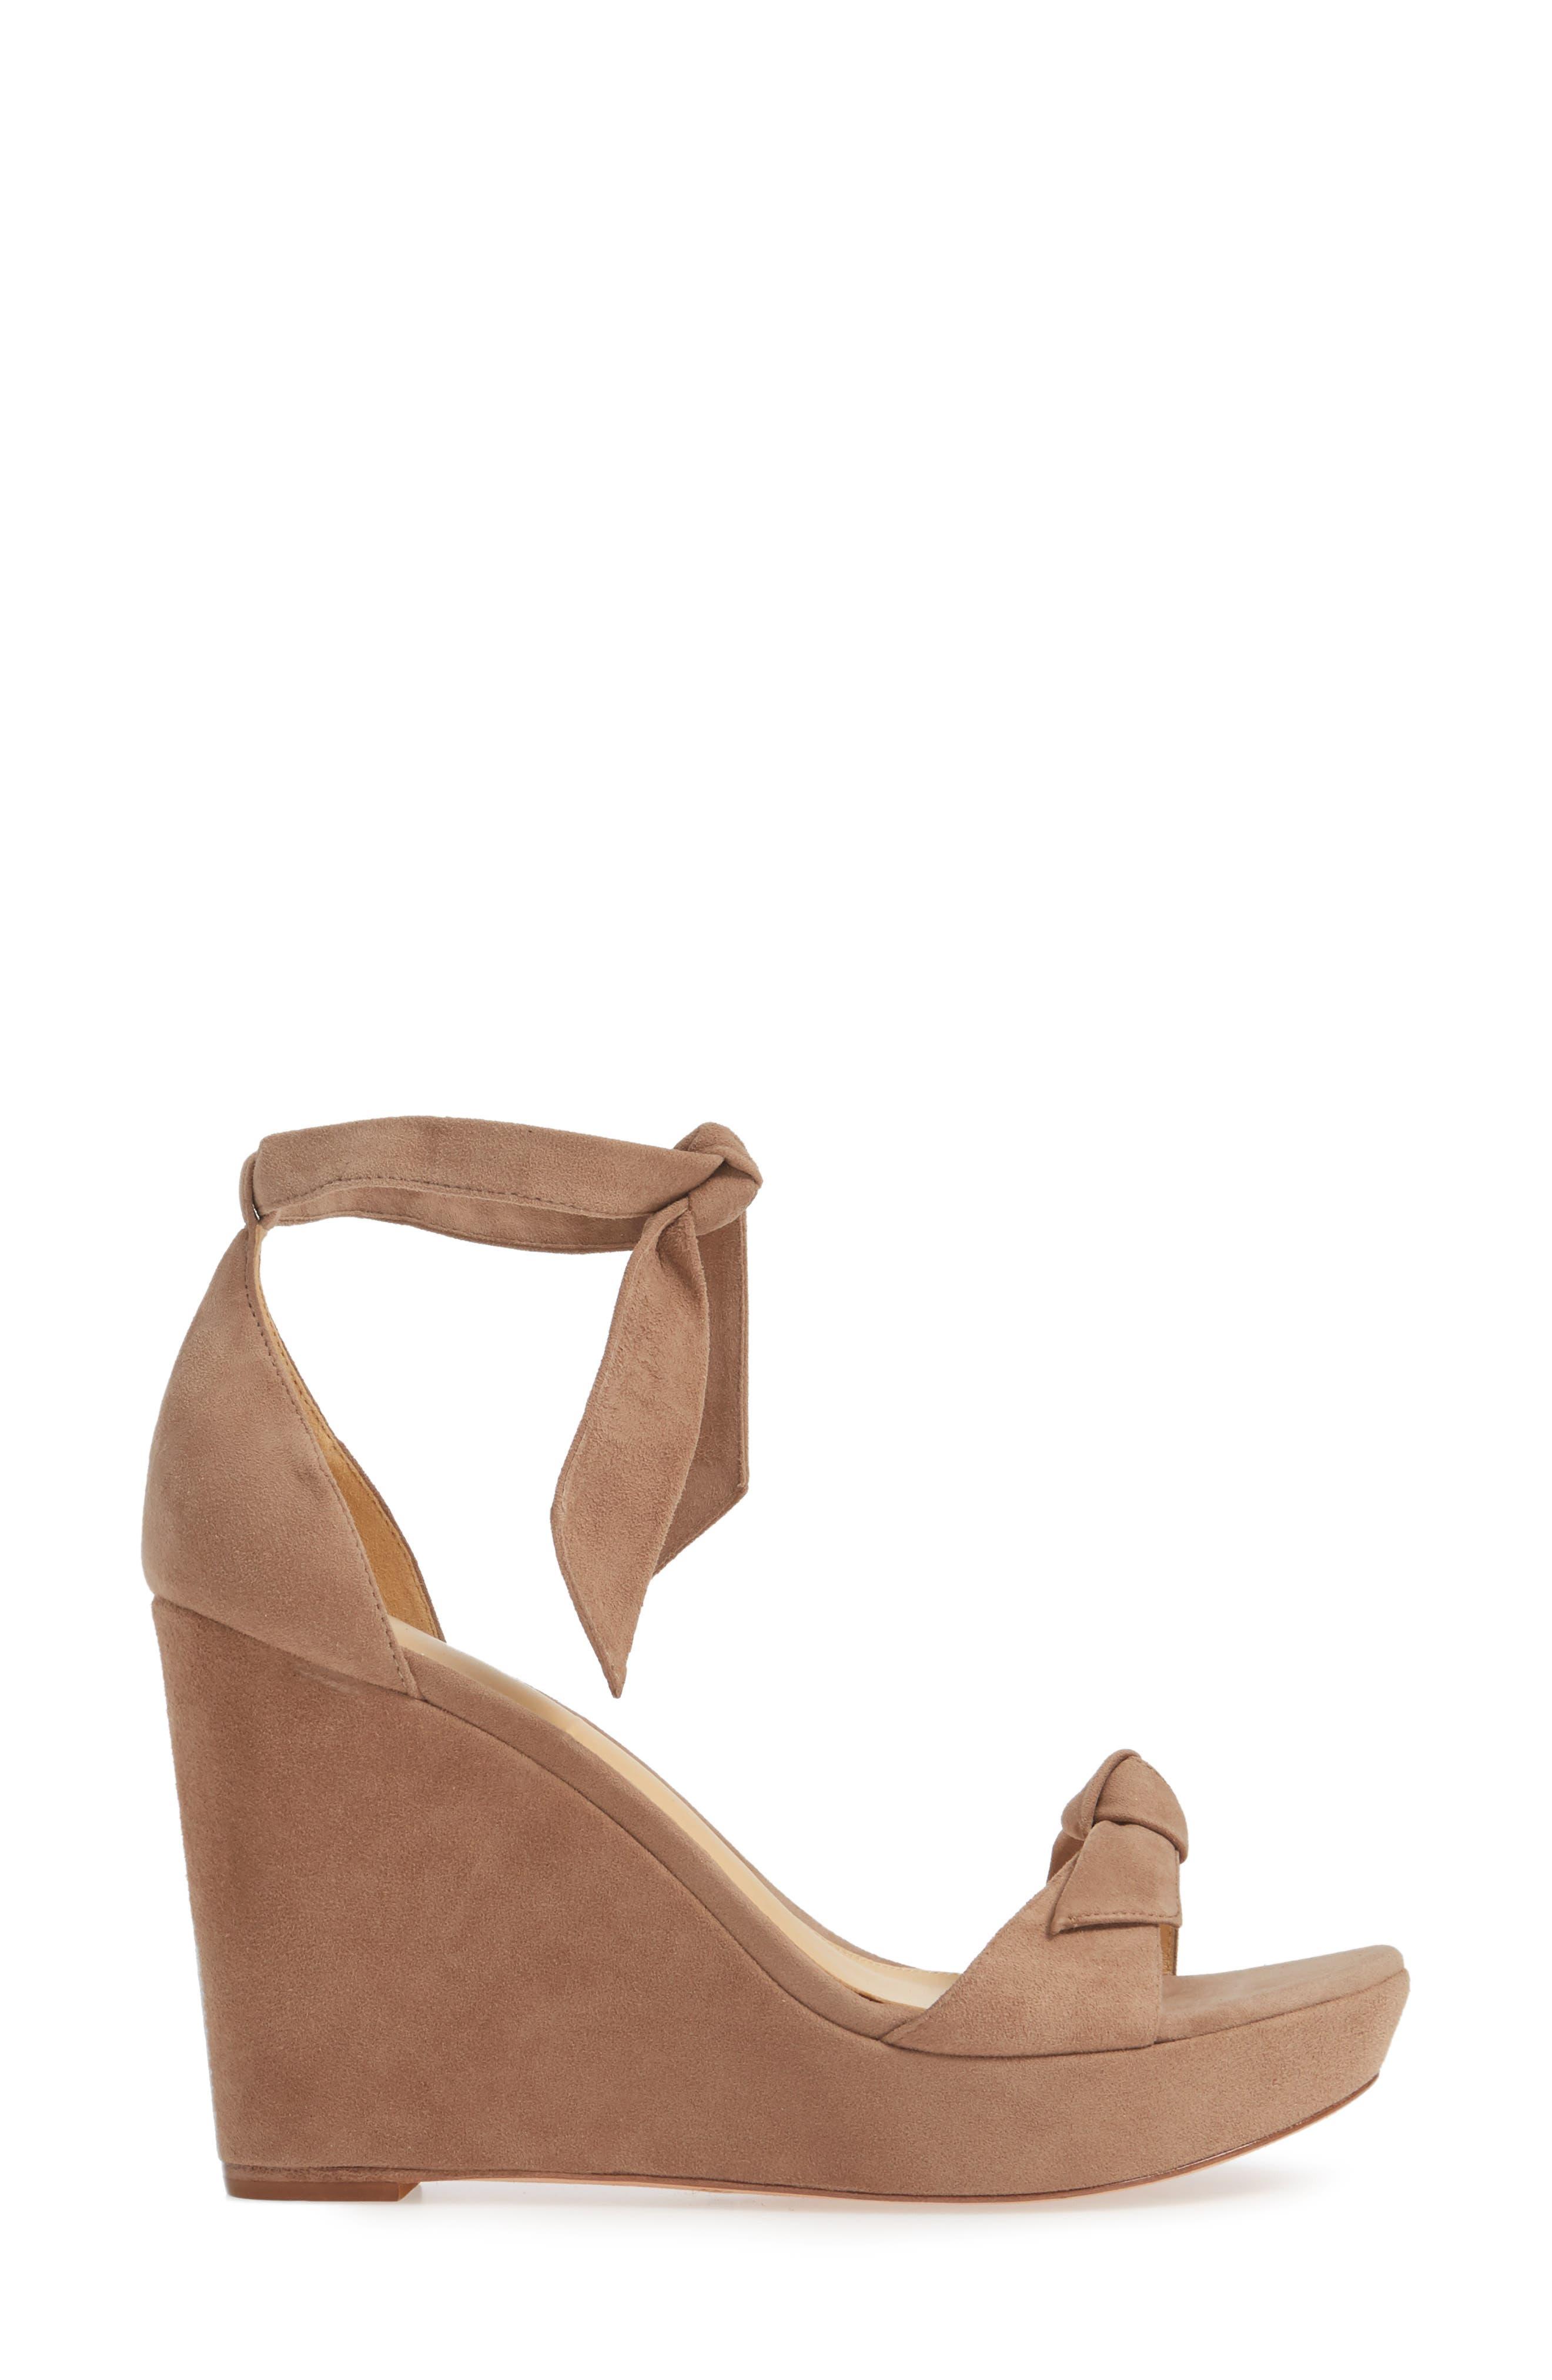 Clarita Platform Wedge Sandal,                             Alternate thumbnail 3, color,                             CAMEO SUEDE